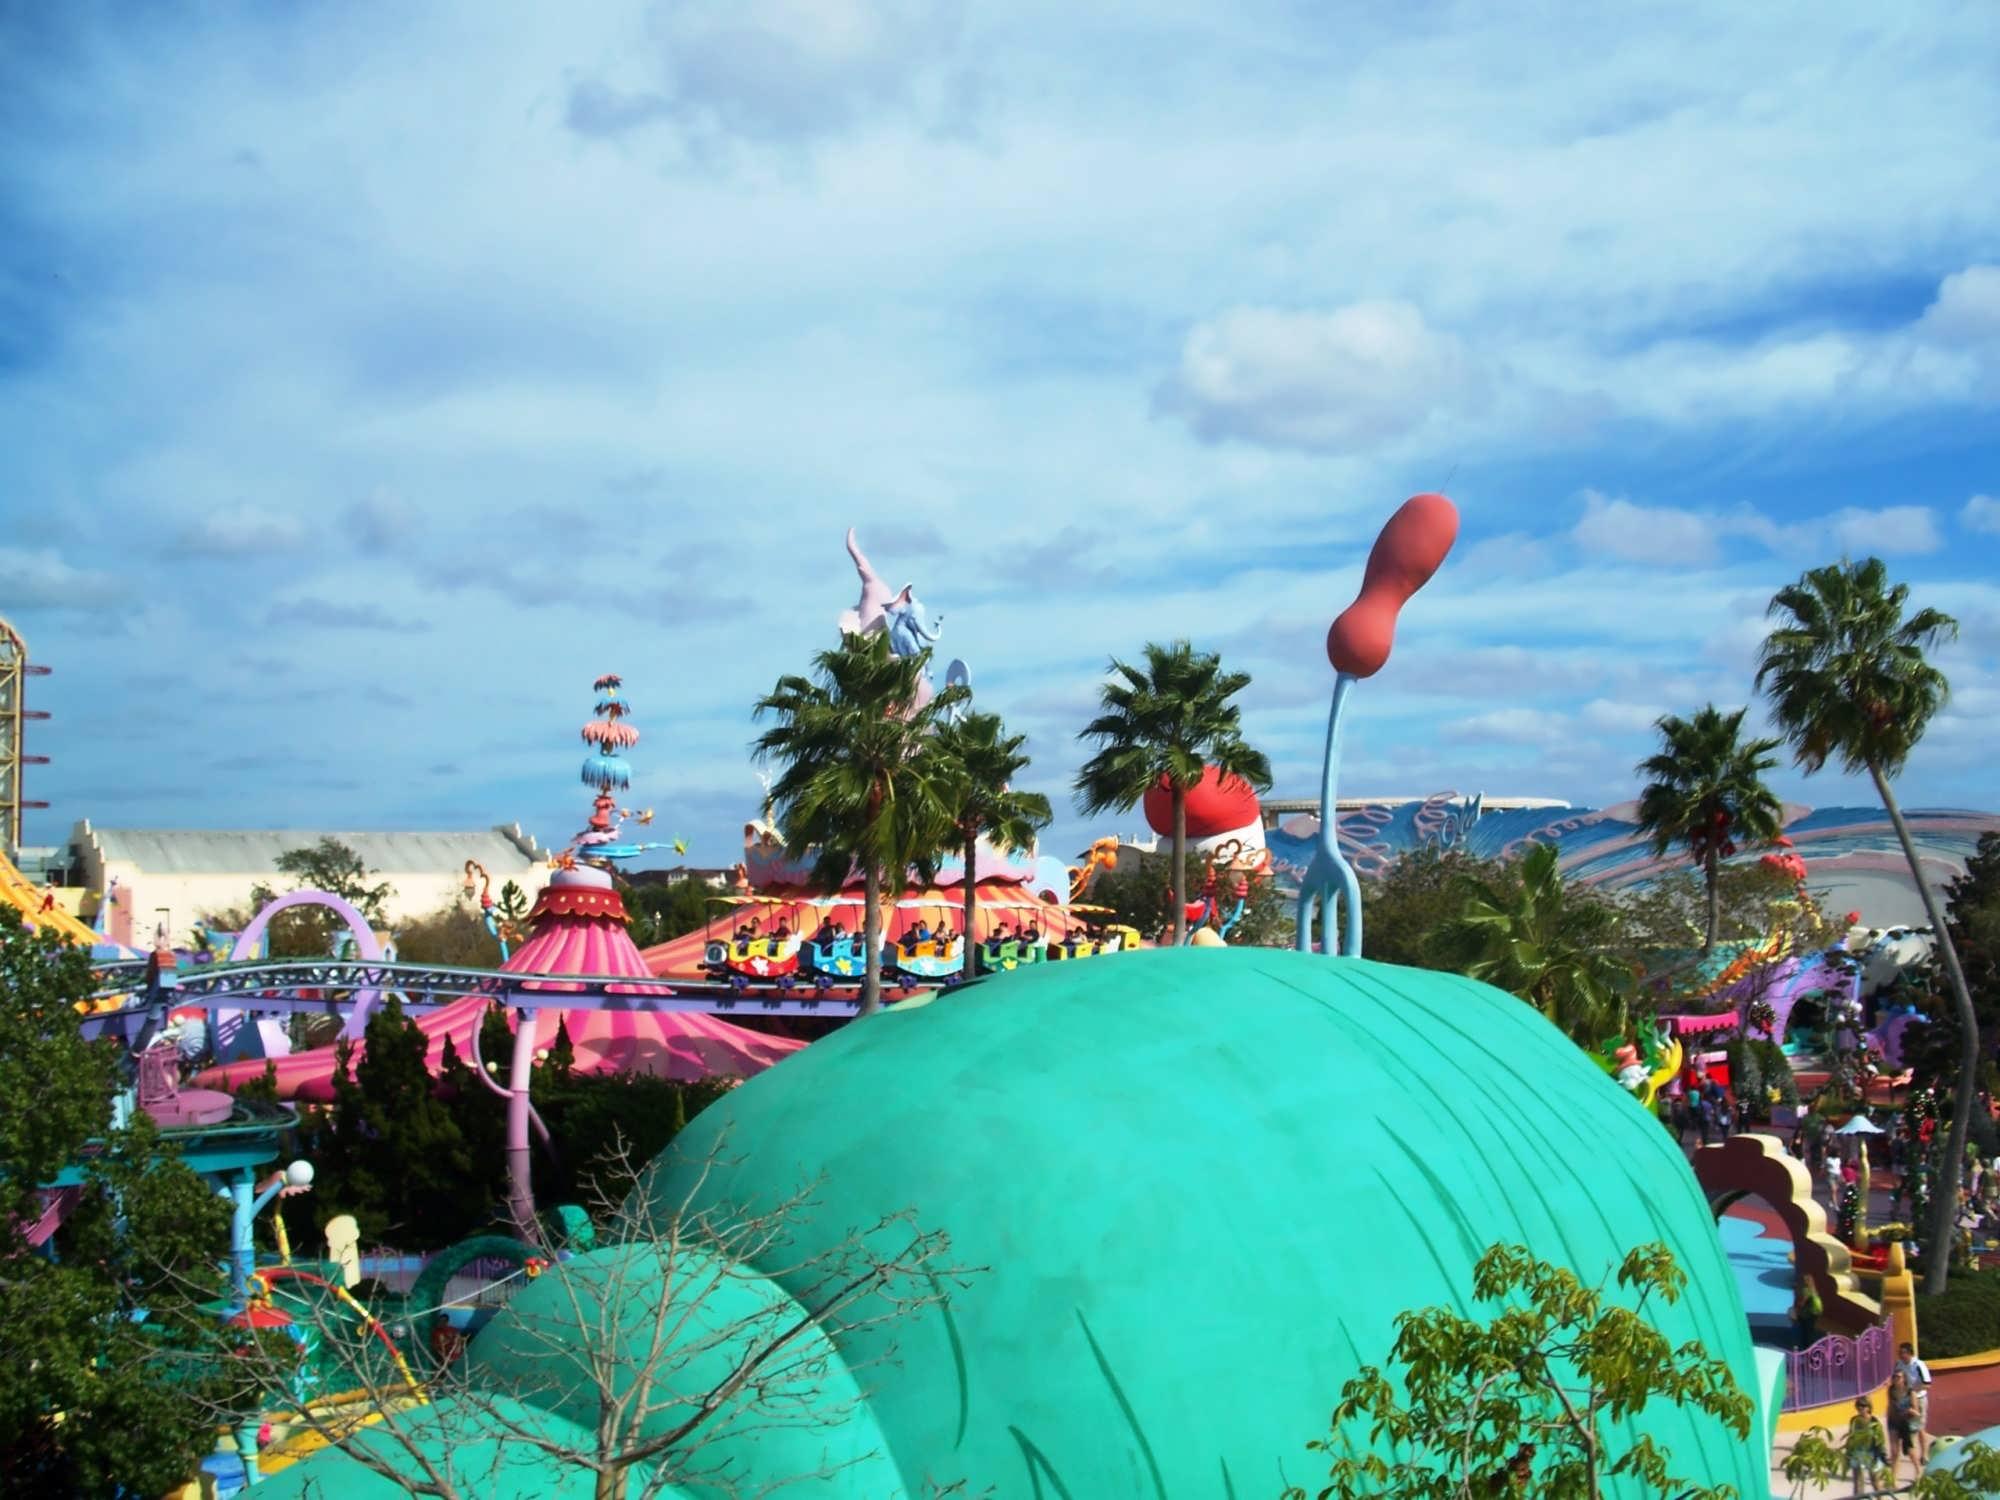 6 best photo spots at Islands of Adventure